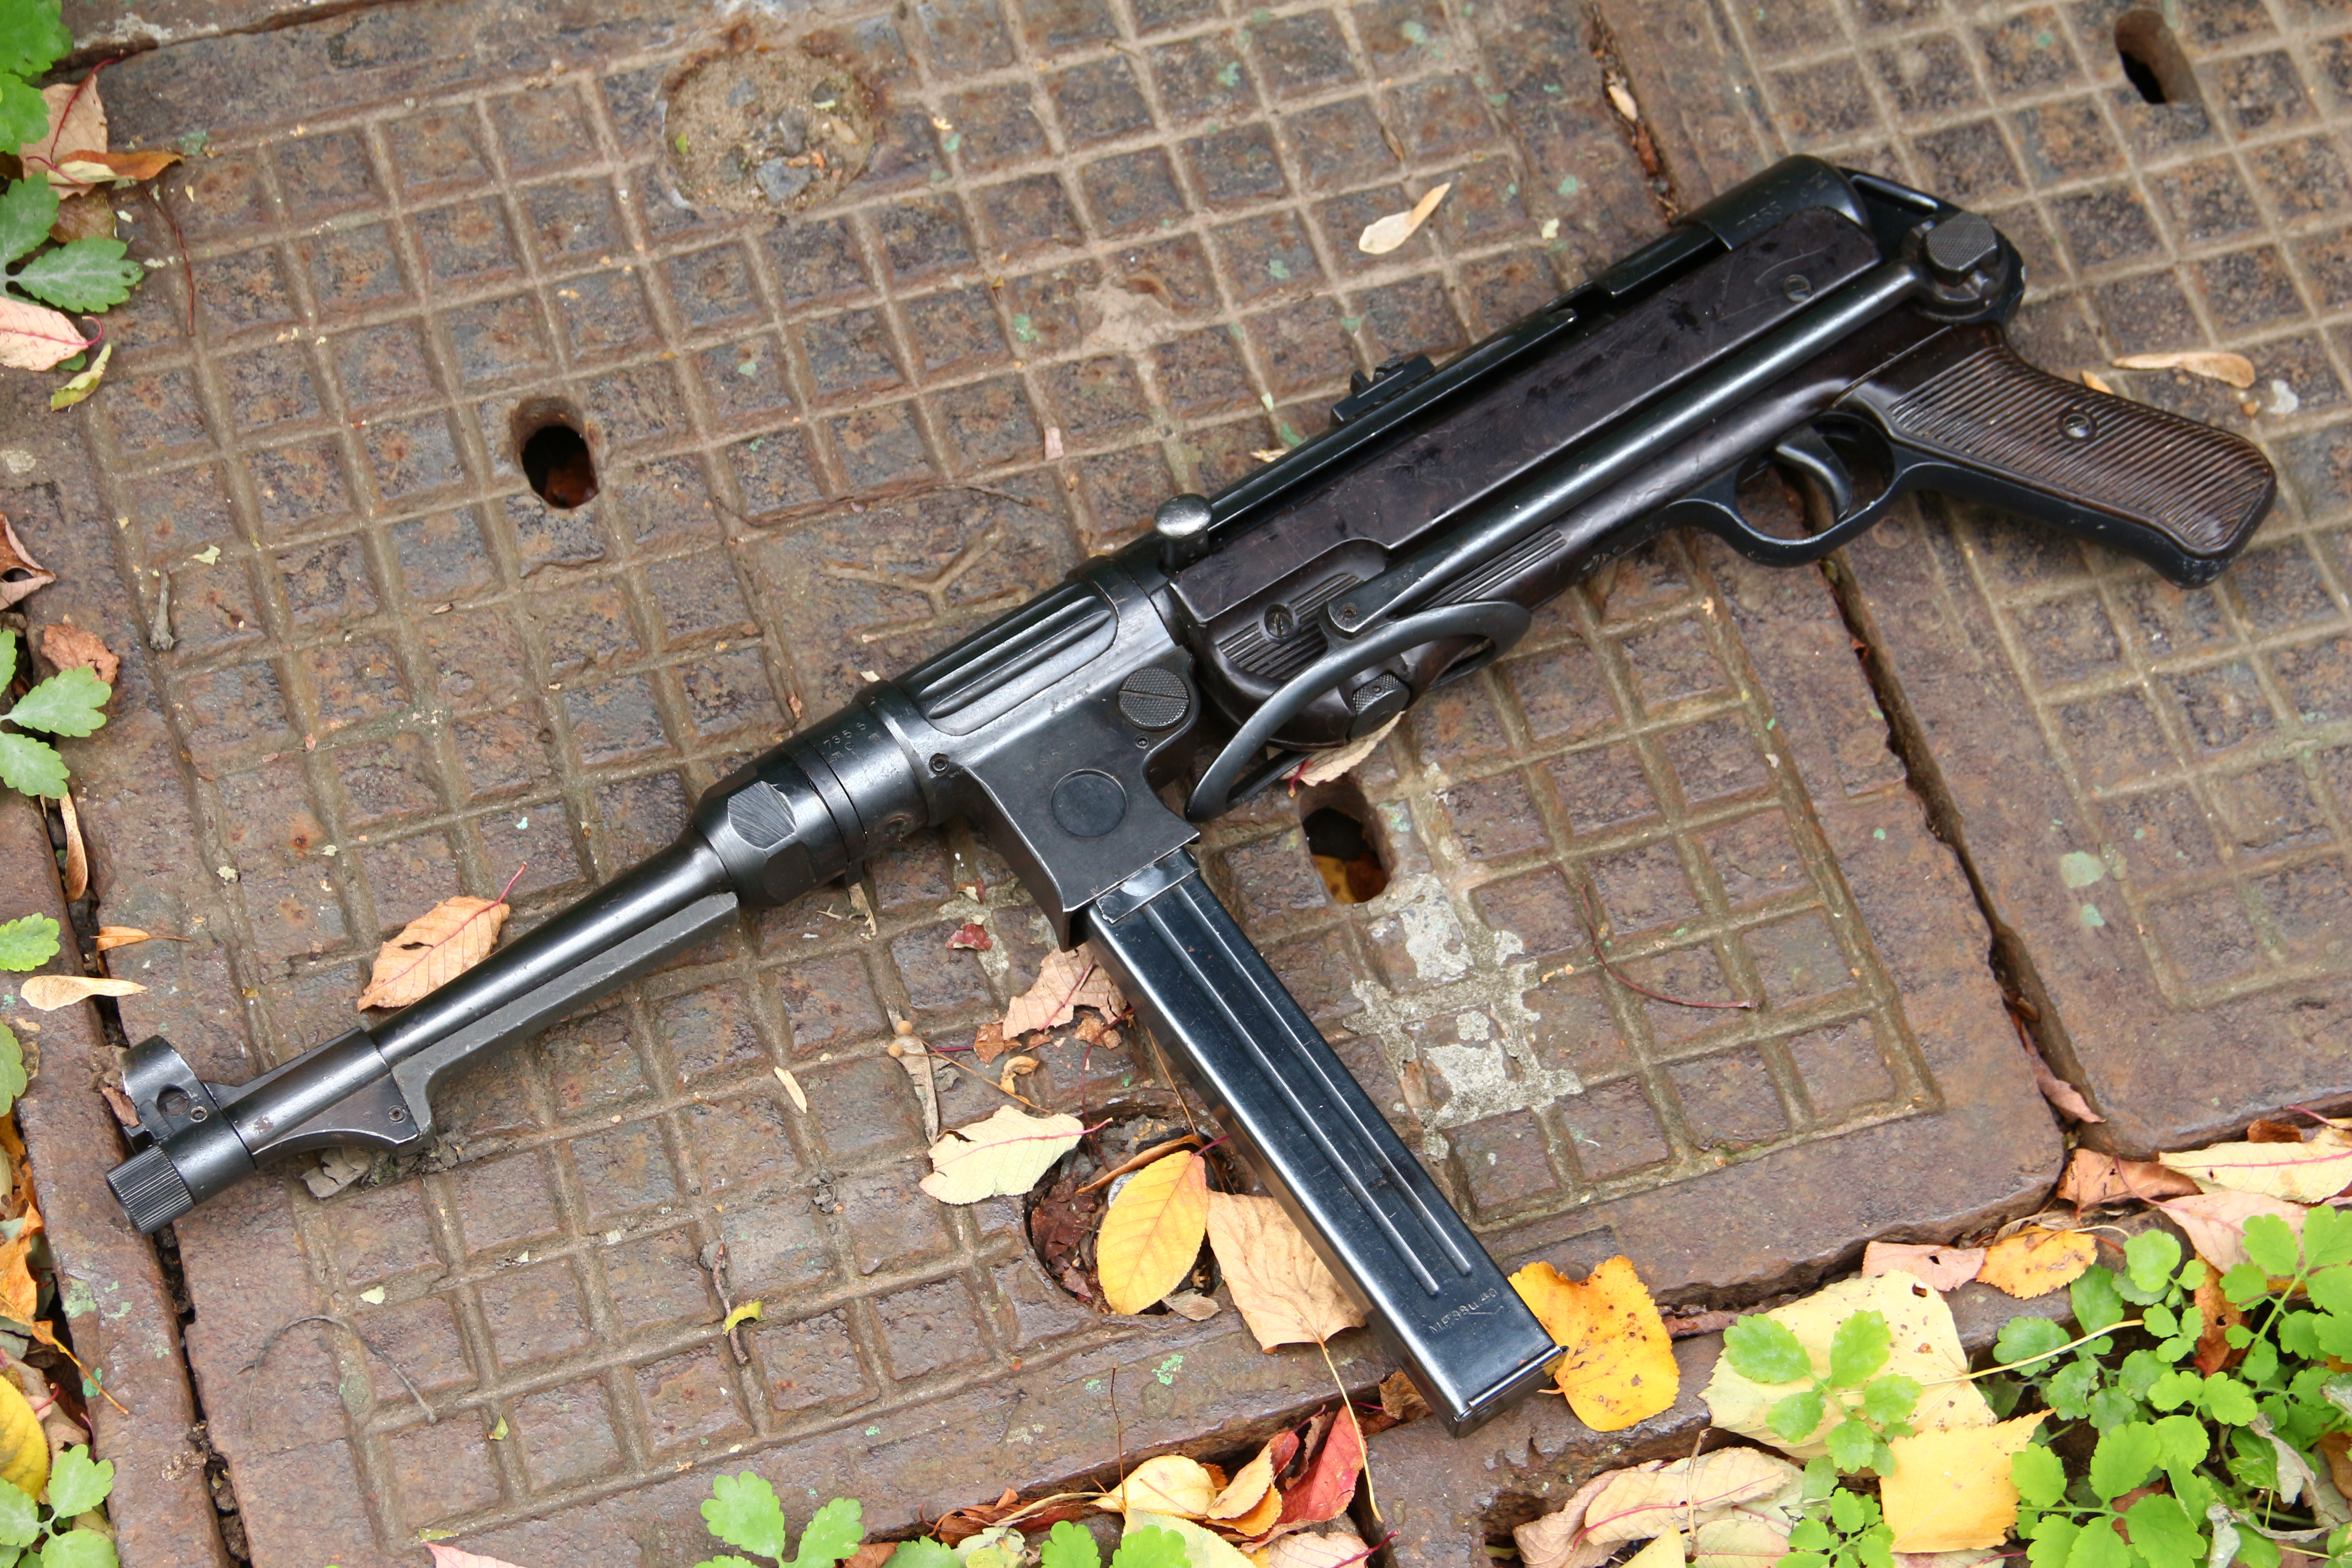 Фото Немецкий пистолет-пулемет M.P. 38 ayf 1941 год #7355c